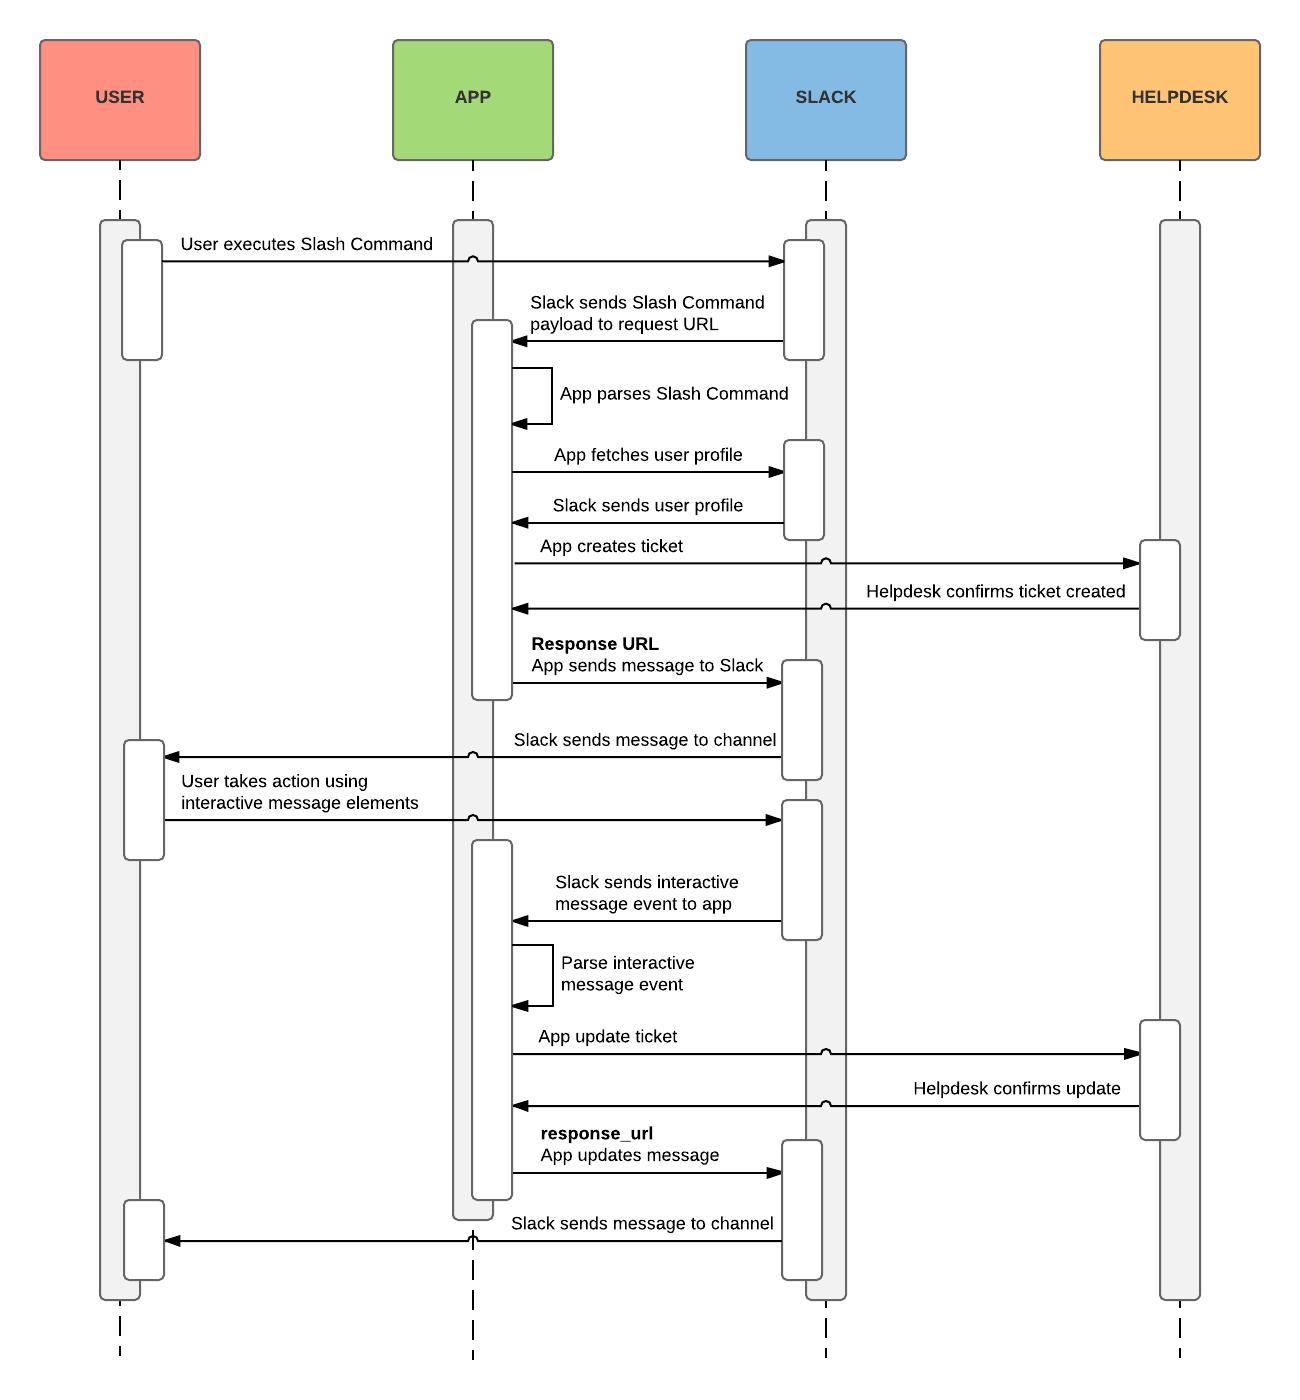 A flow diagram detailing a slash command that triggers a dialog